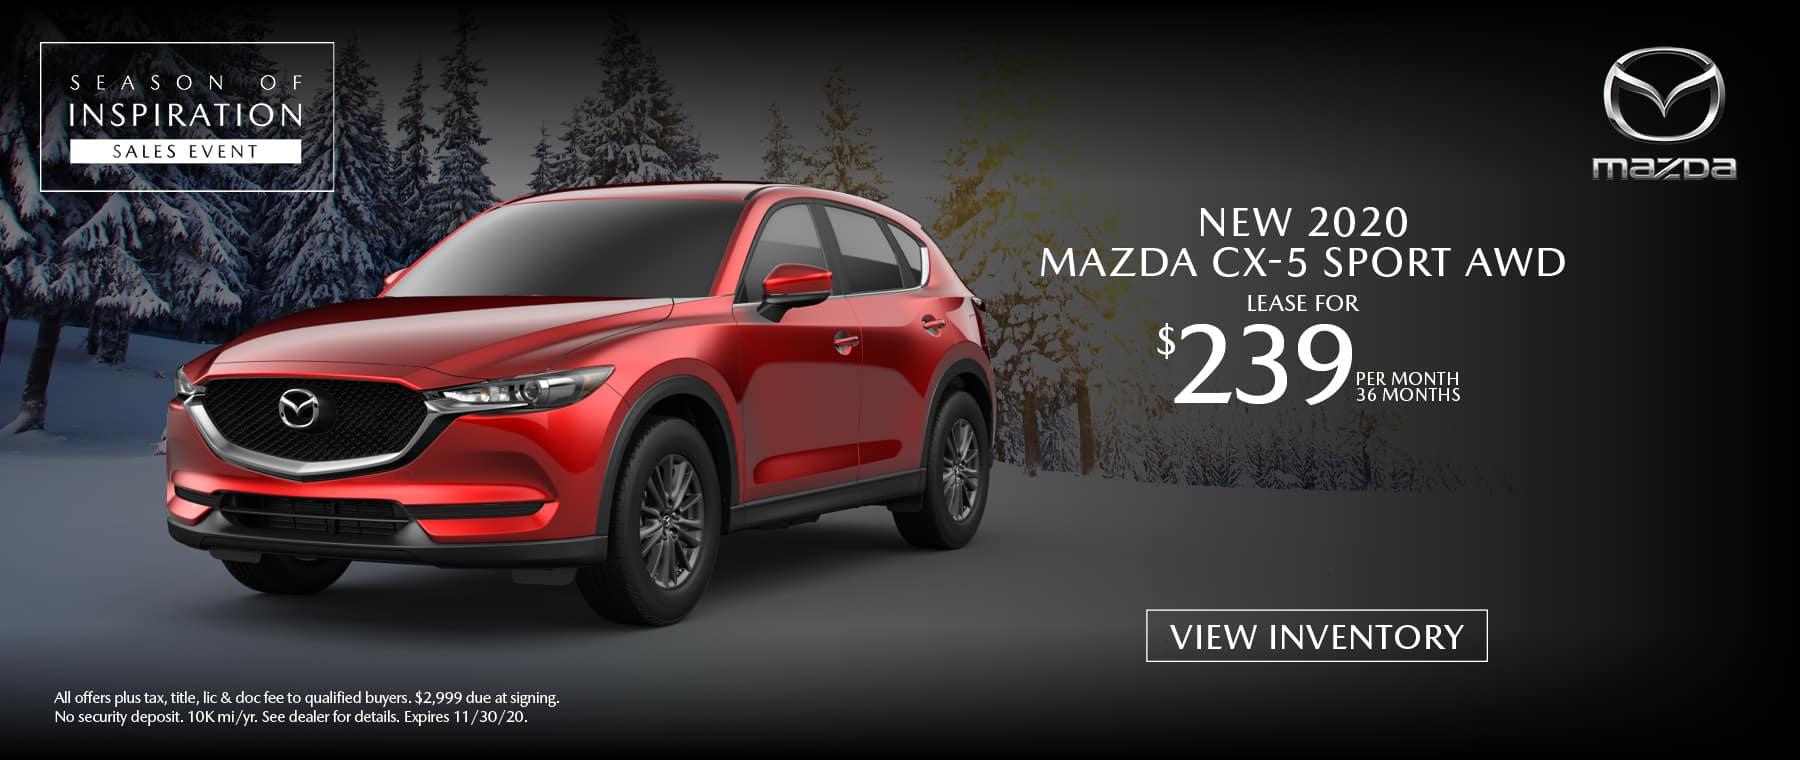 PUGI-MAZ-CX5-SPT-$239-NOV-1800×760